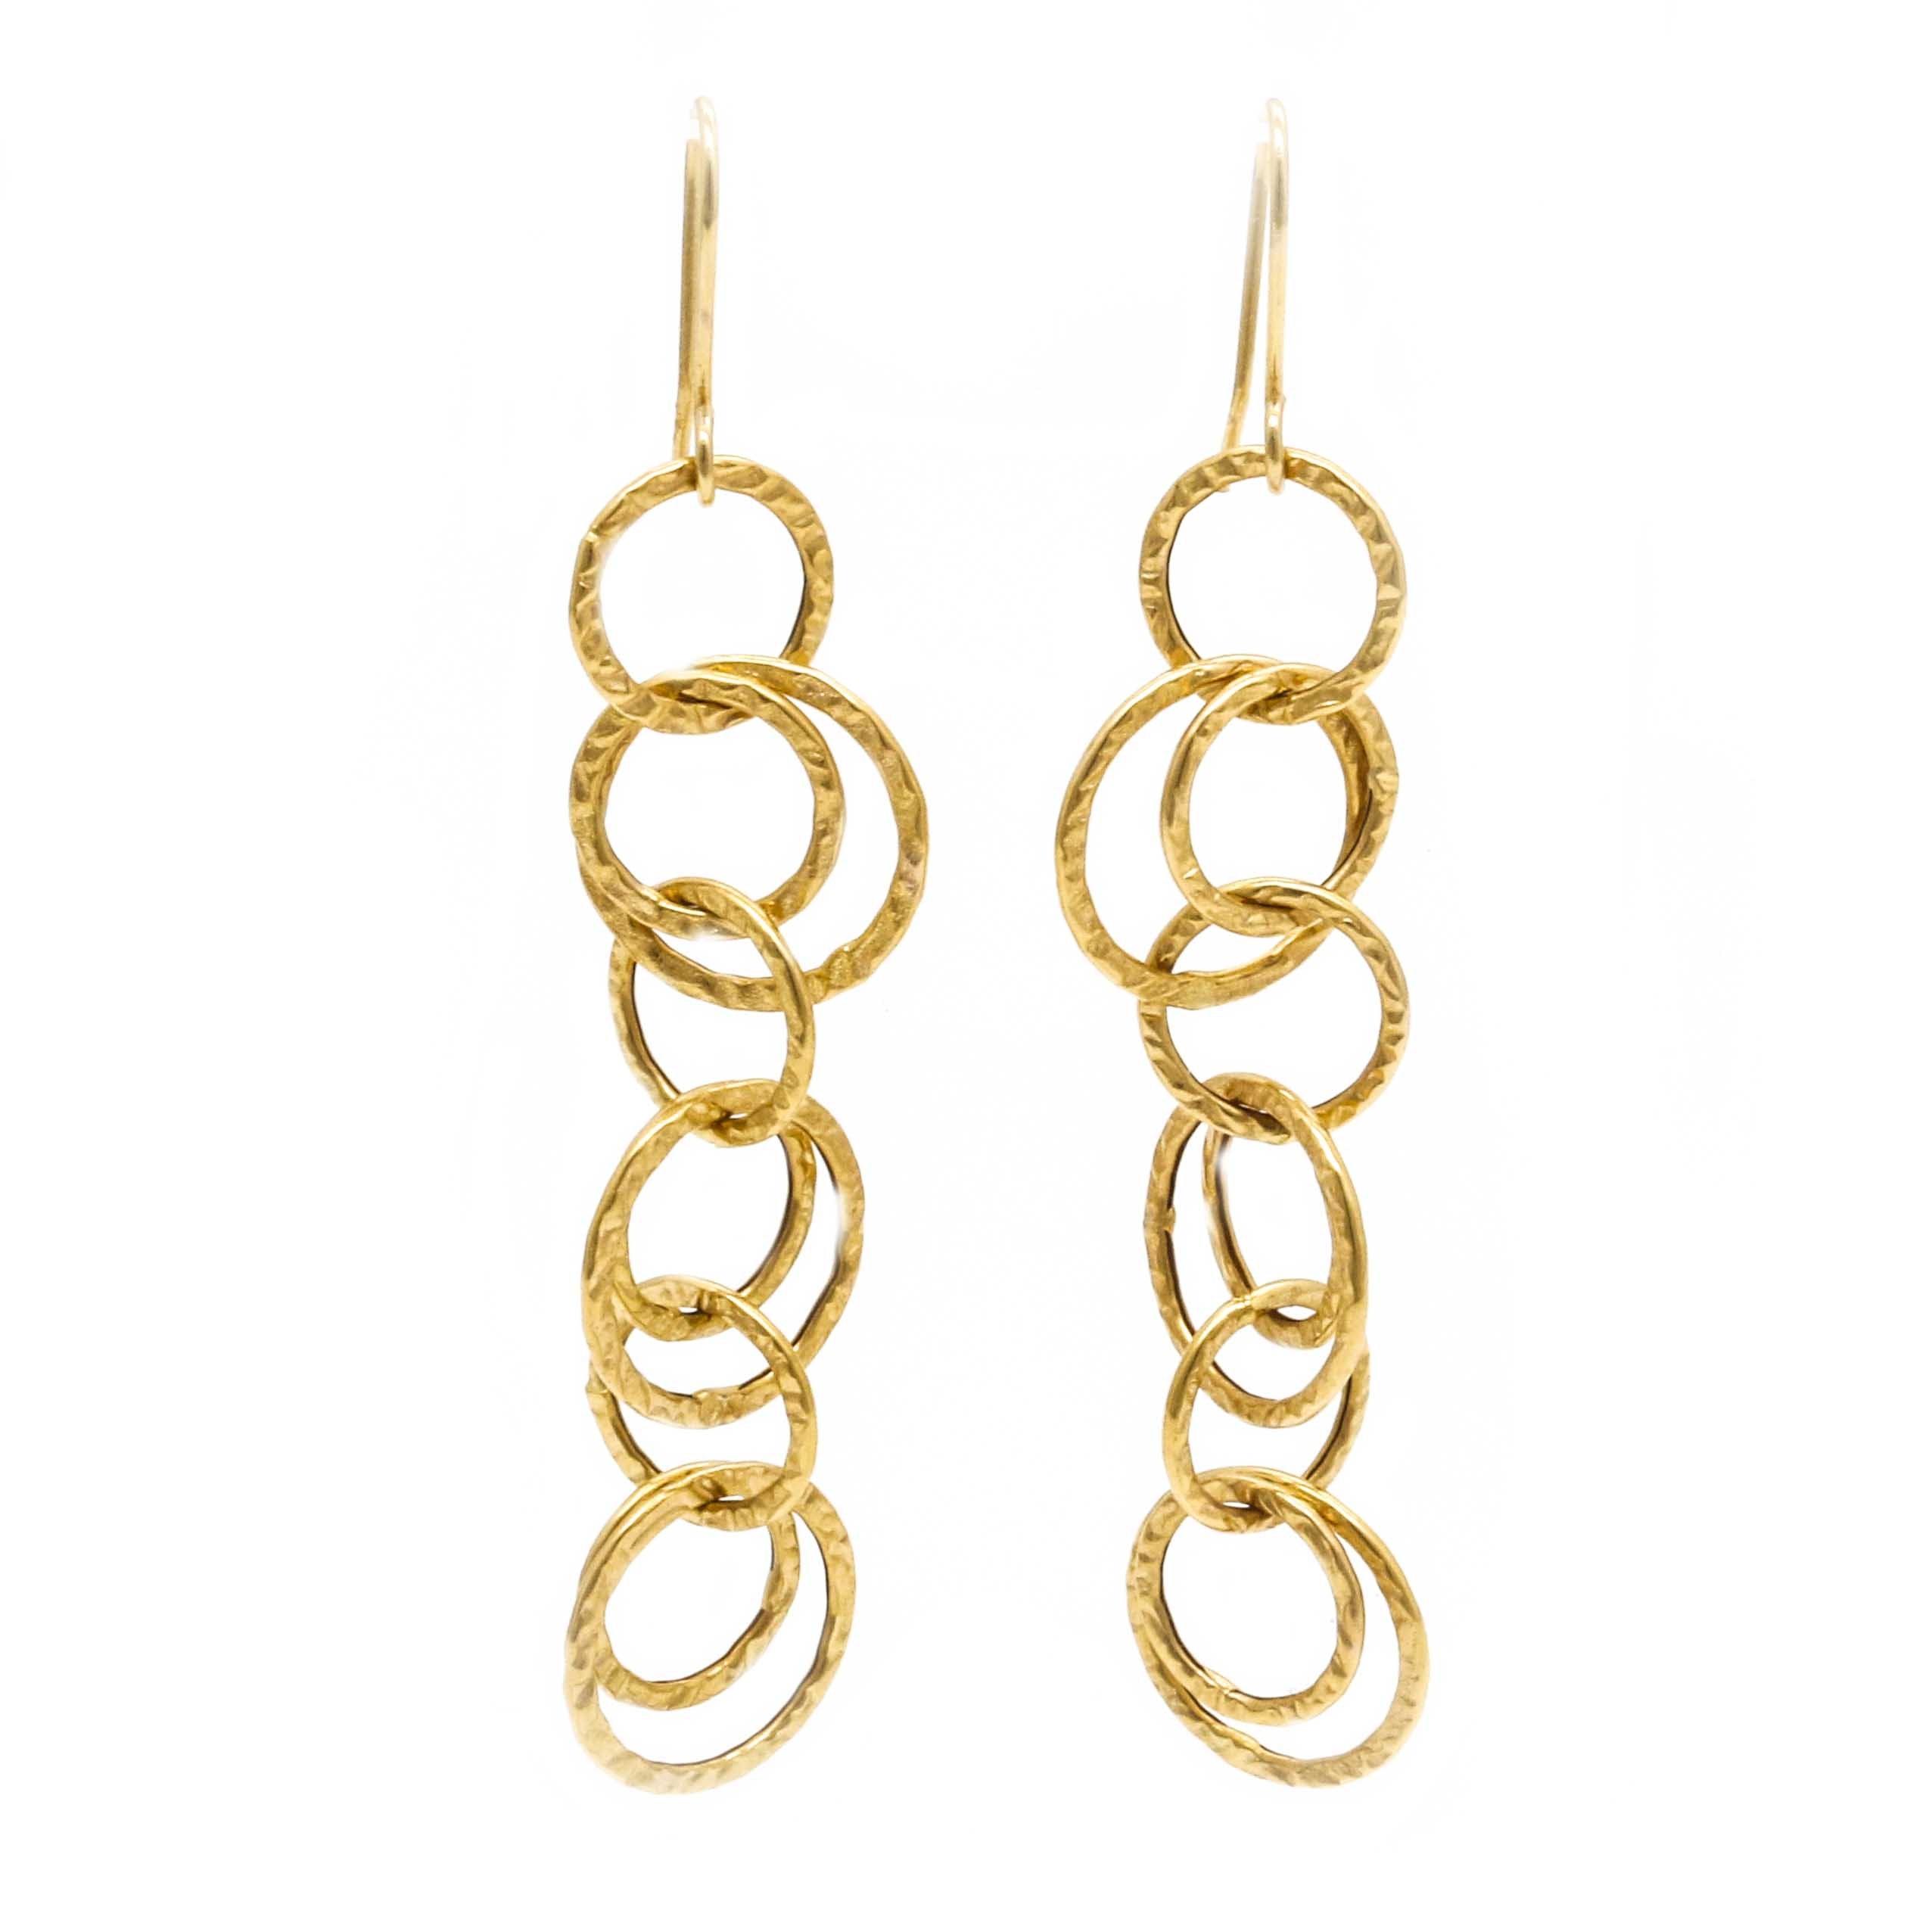 14K Yellow Gold Hoop Dangling Earrings